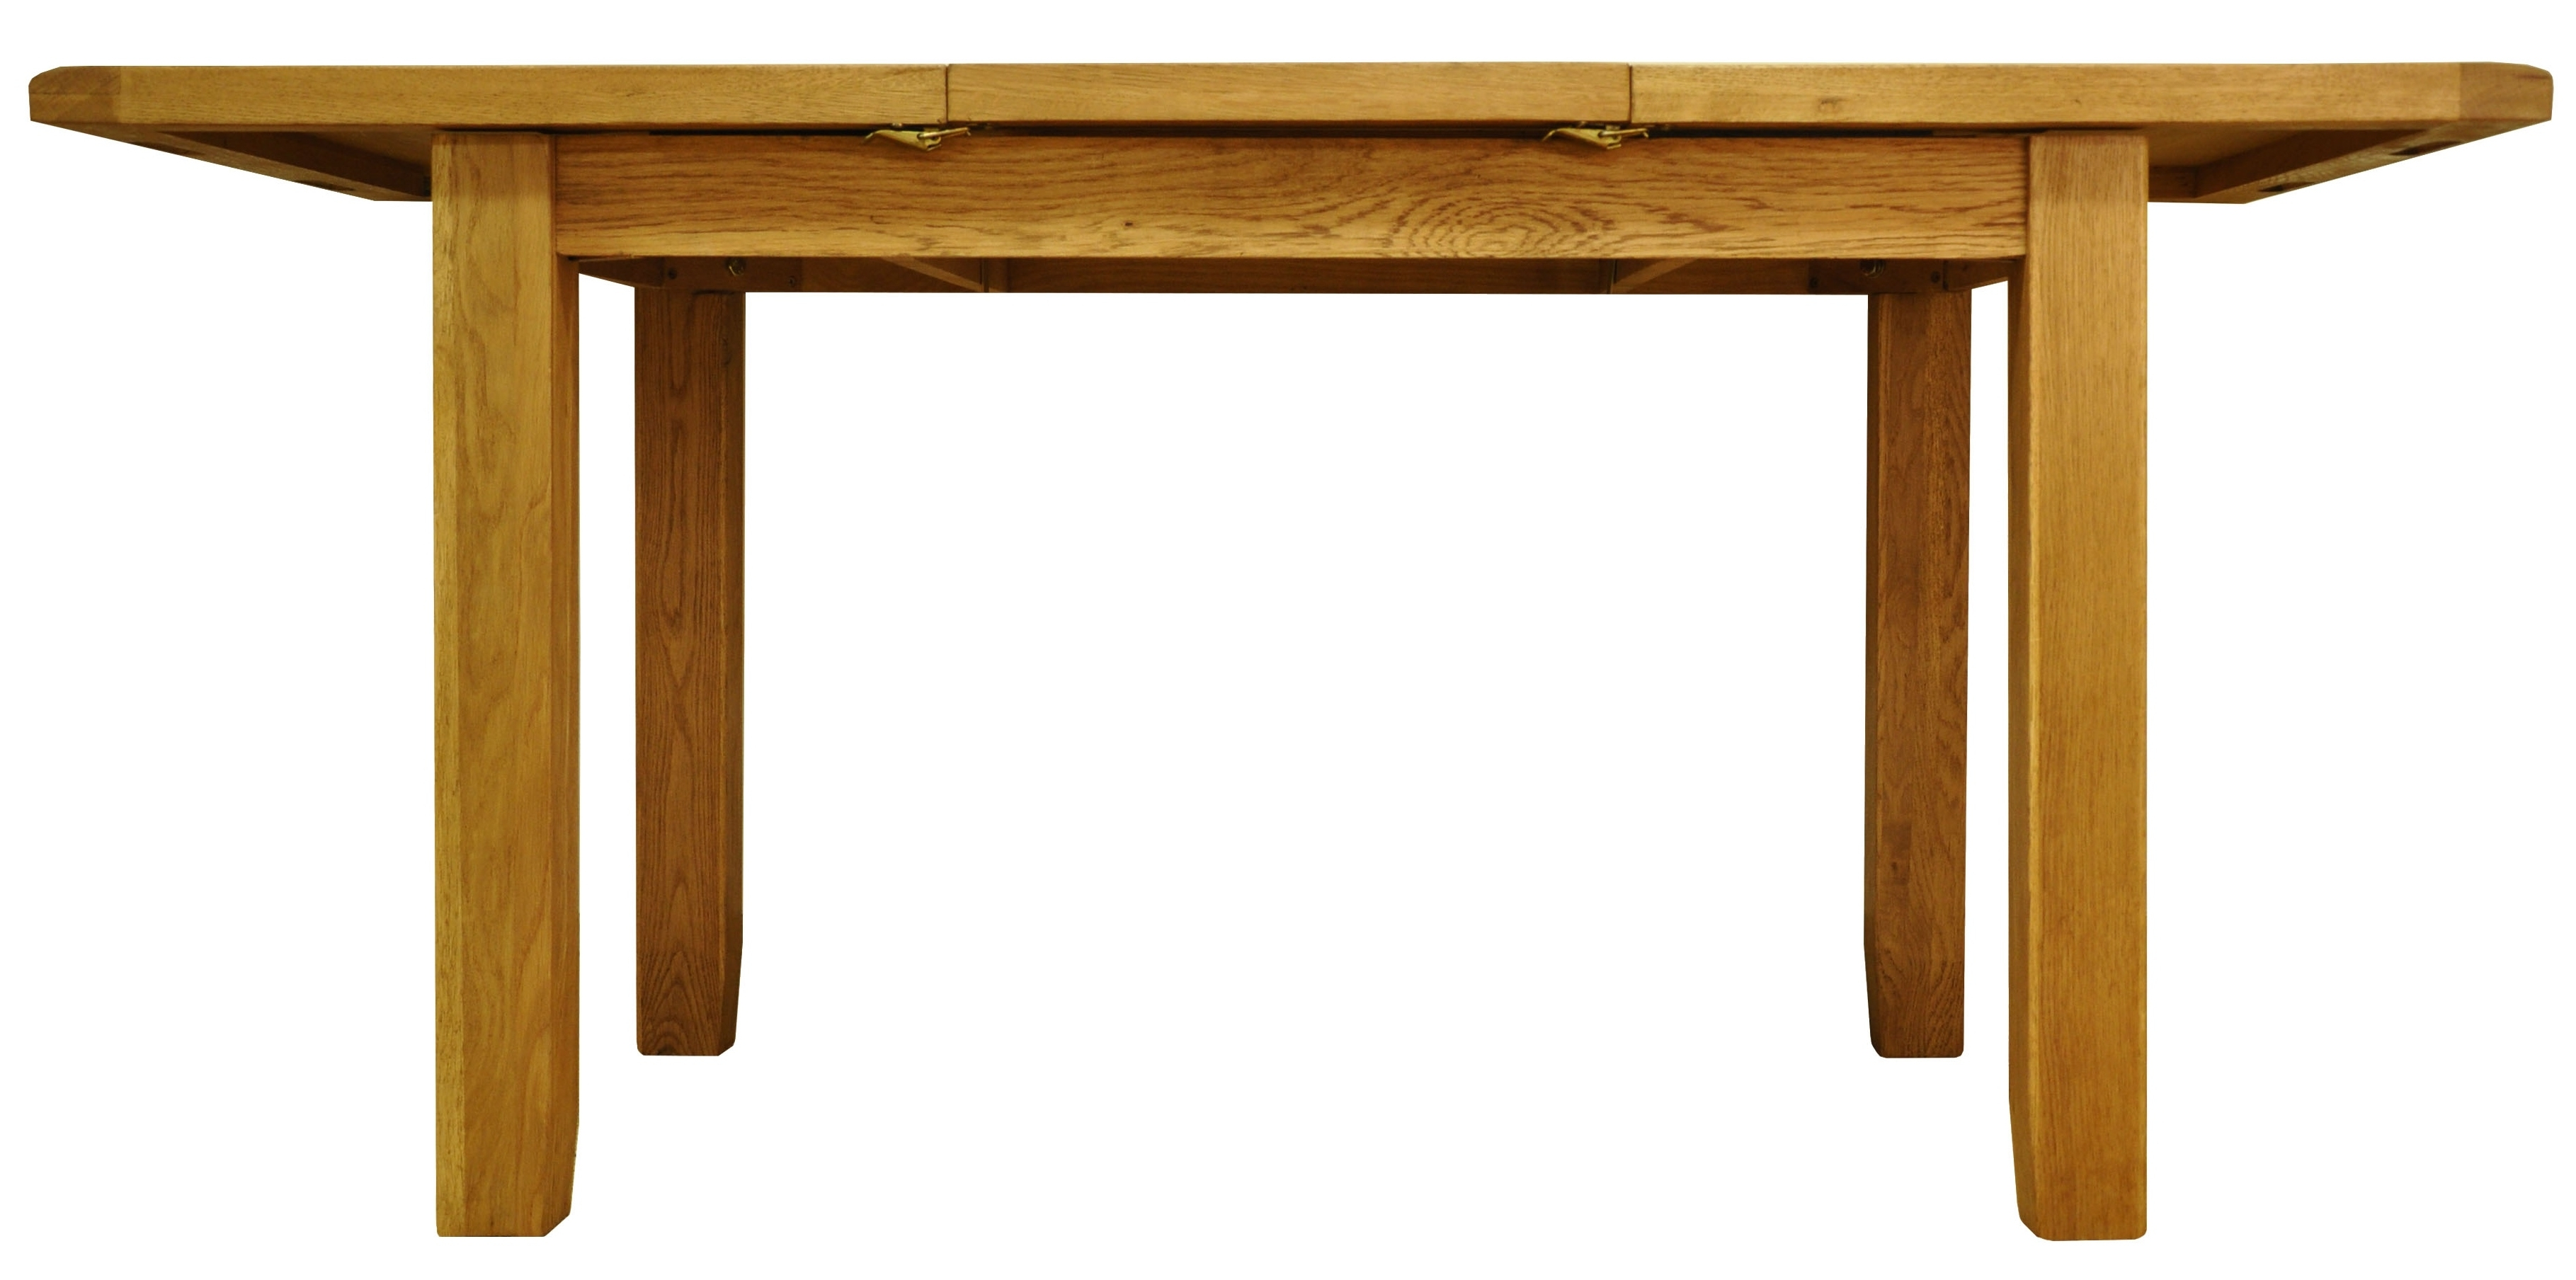 Popular Dining Tables : Stanton Small Butterfly Rustic Oak Extending Dining Regarding Flip Top Oak Dining Tables (View 11 of 25)